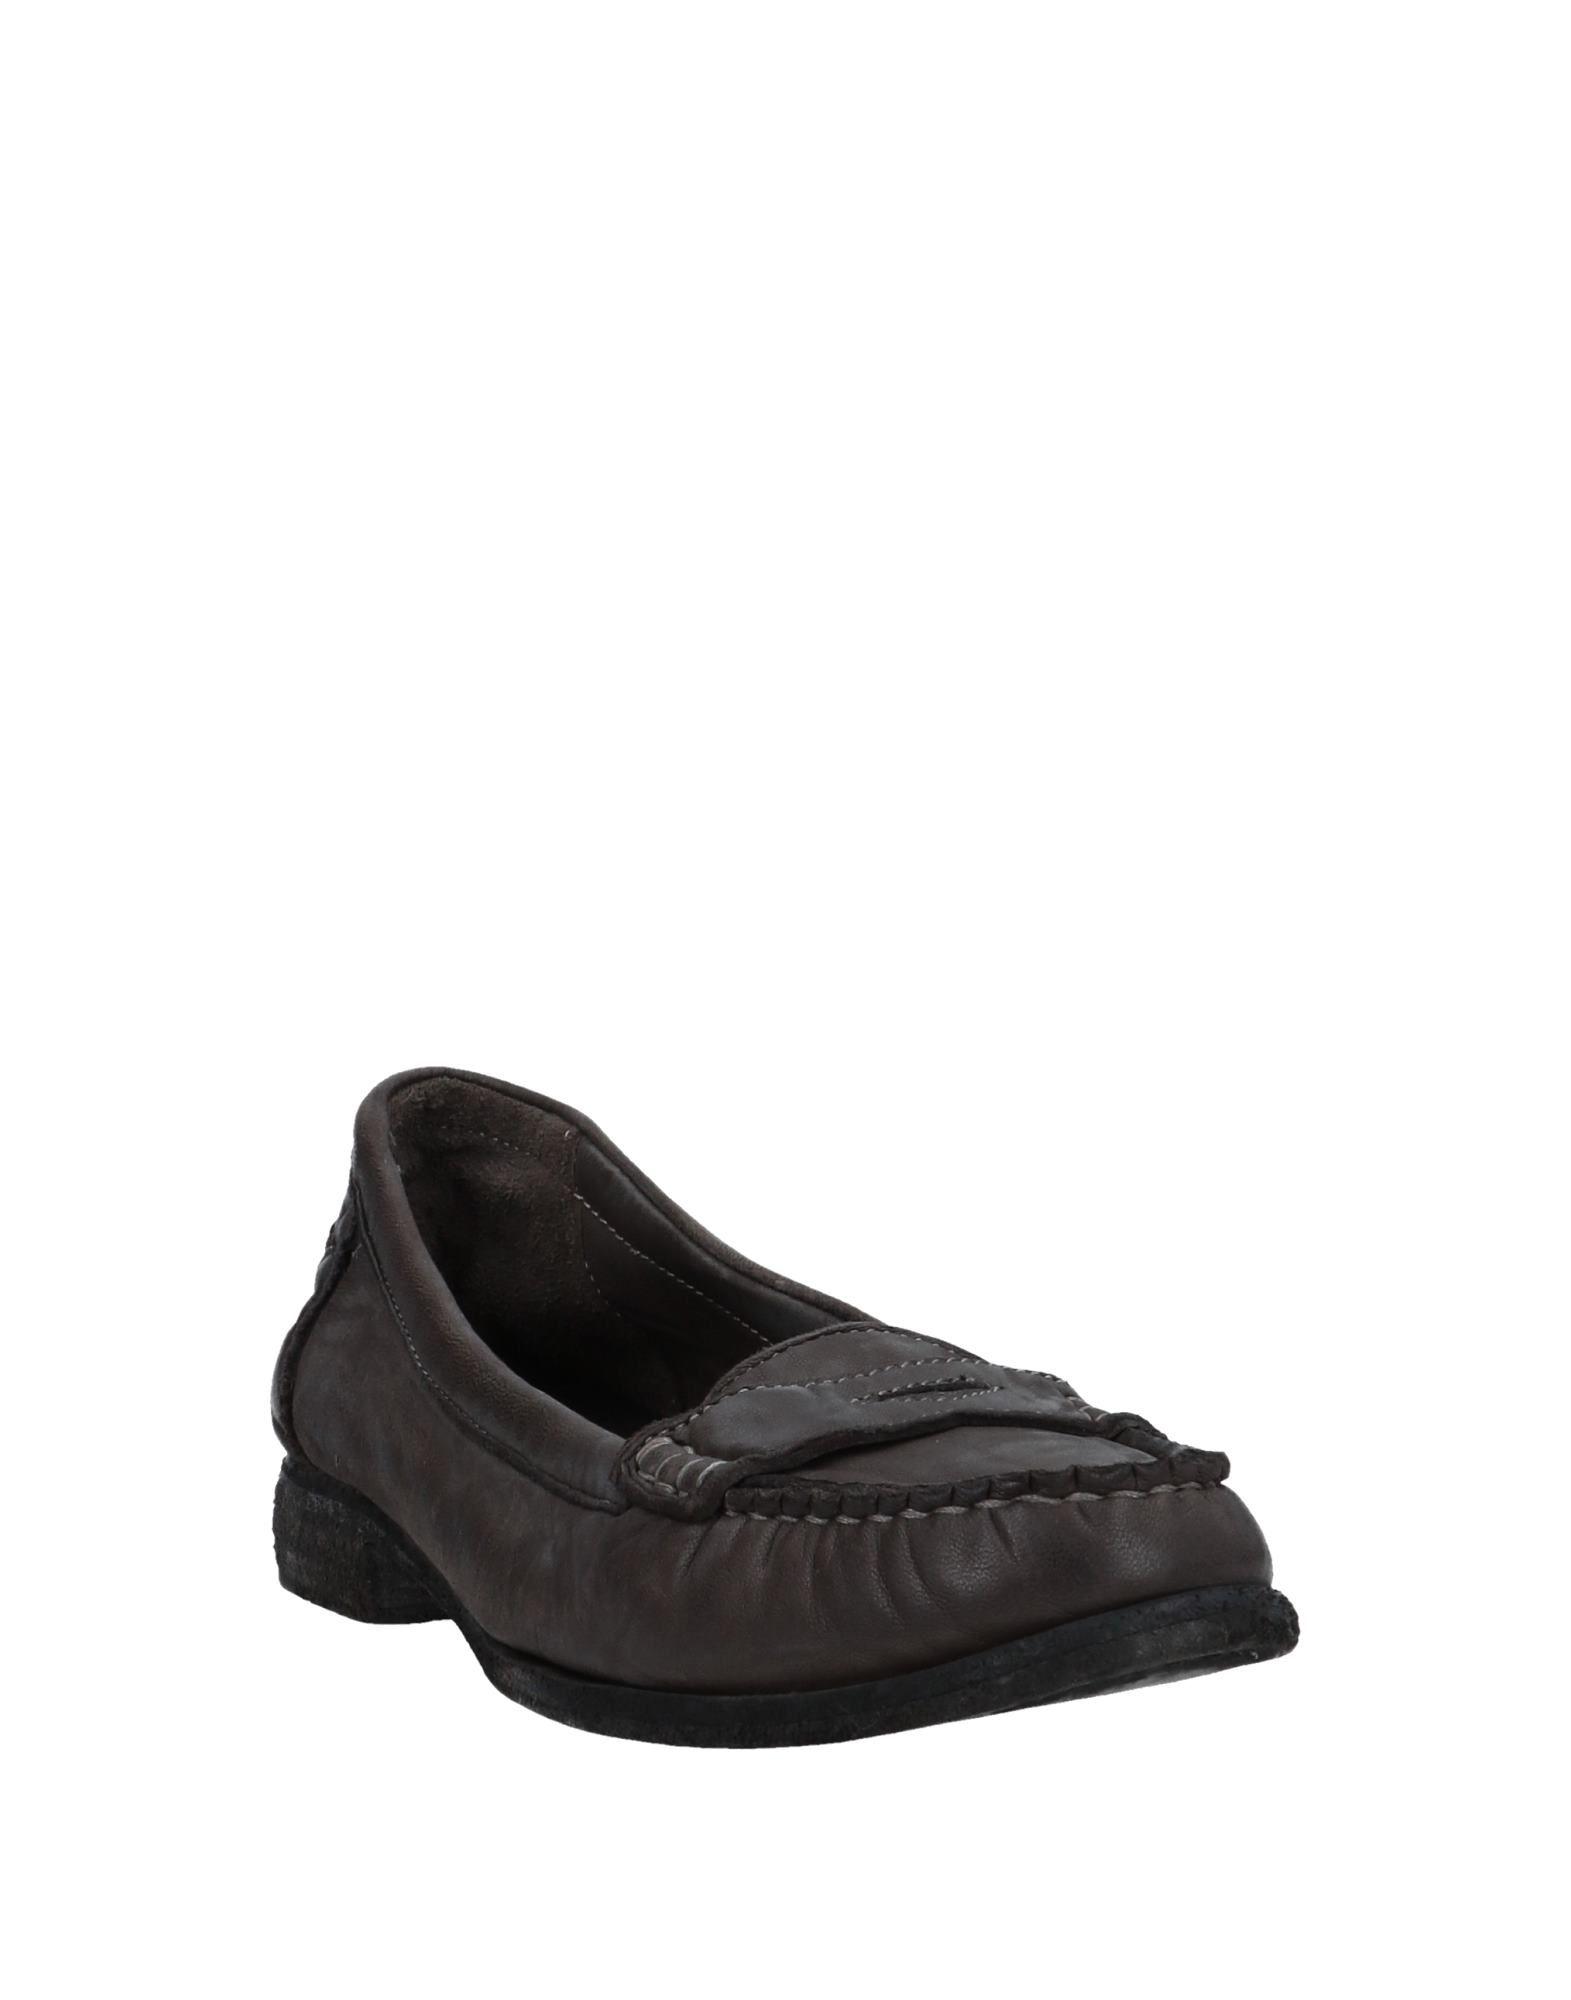 Stilvolle billige Schuhe Pantofola D'oro Mokassins Damen  11548684UN